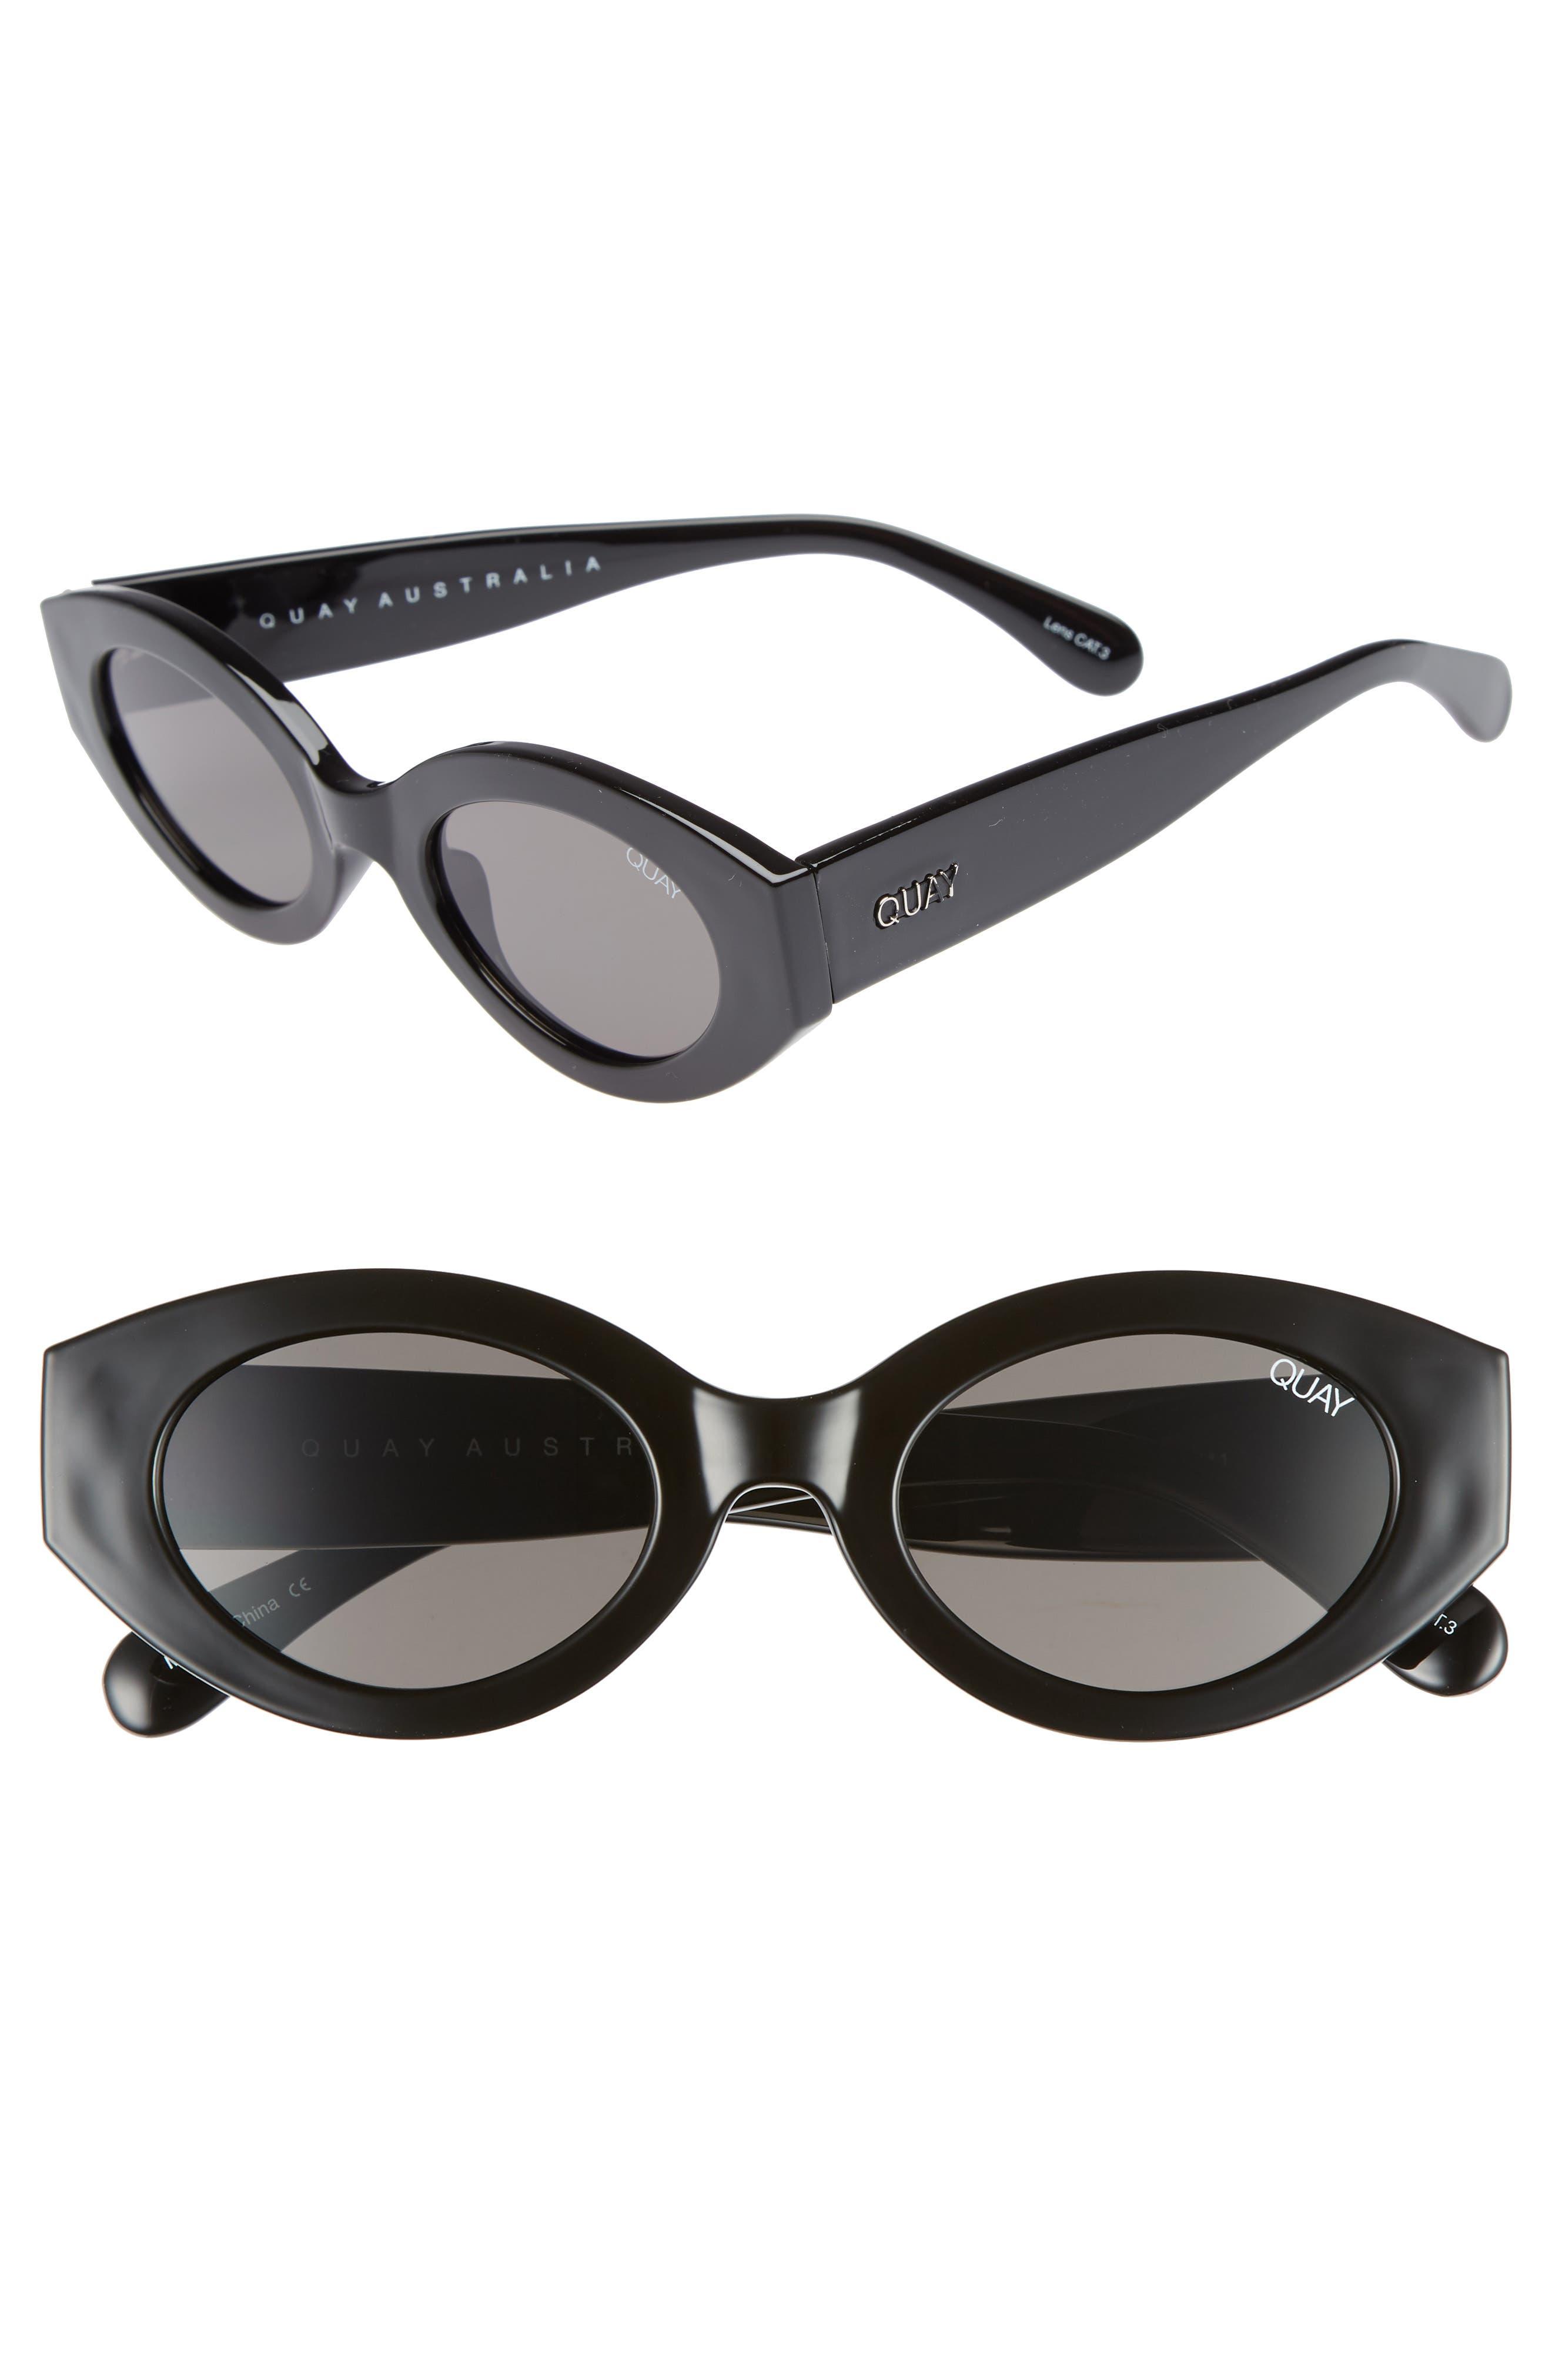 See Me Smile 50mm Cat Eye Sunglasses,                             Main thumbnail 1, color,                             Black/ Smoke